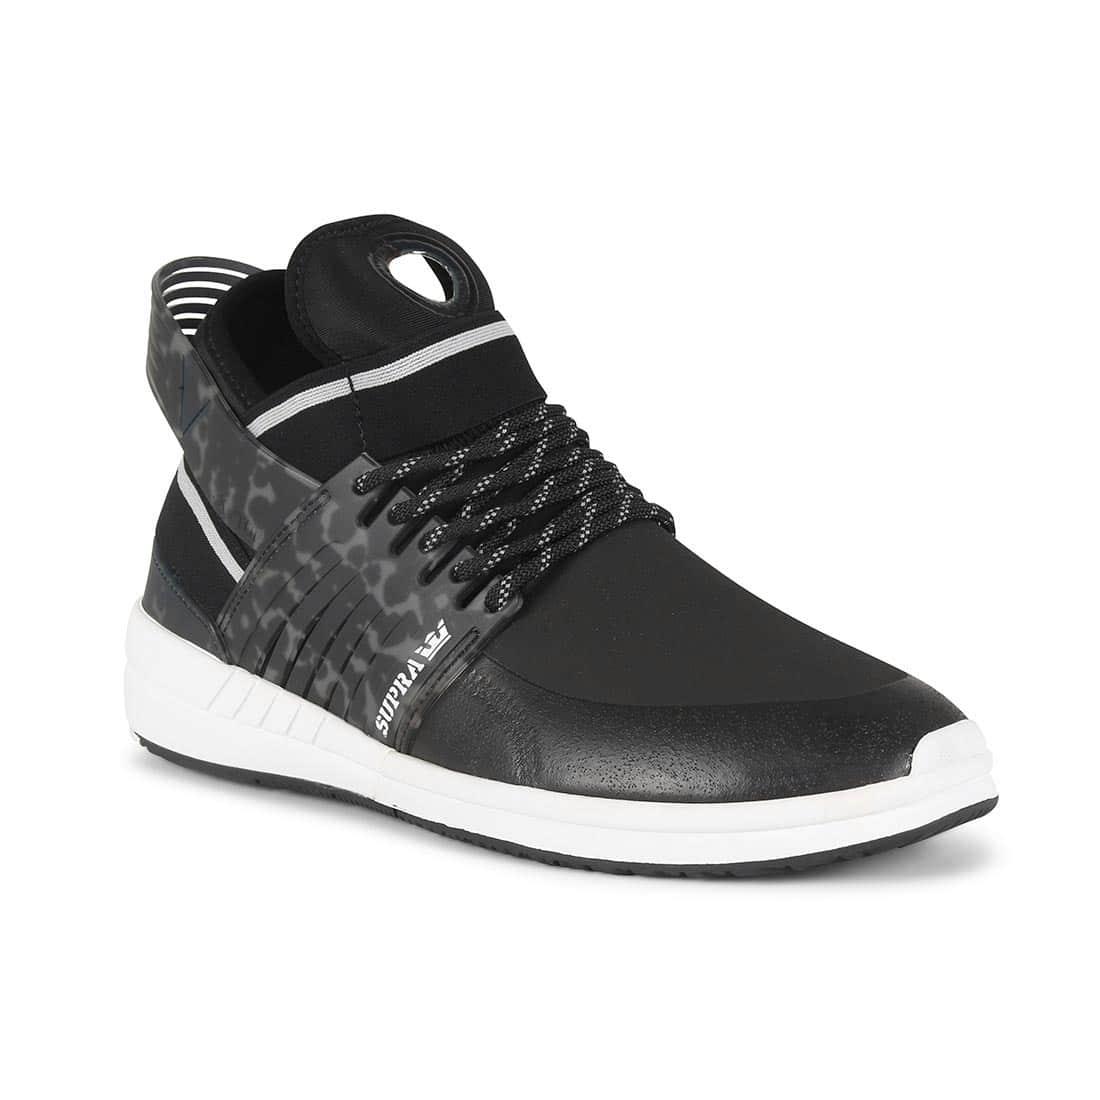 Supra Skytop V Shoes - Black / White